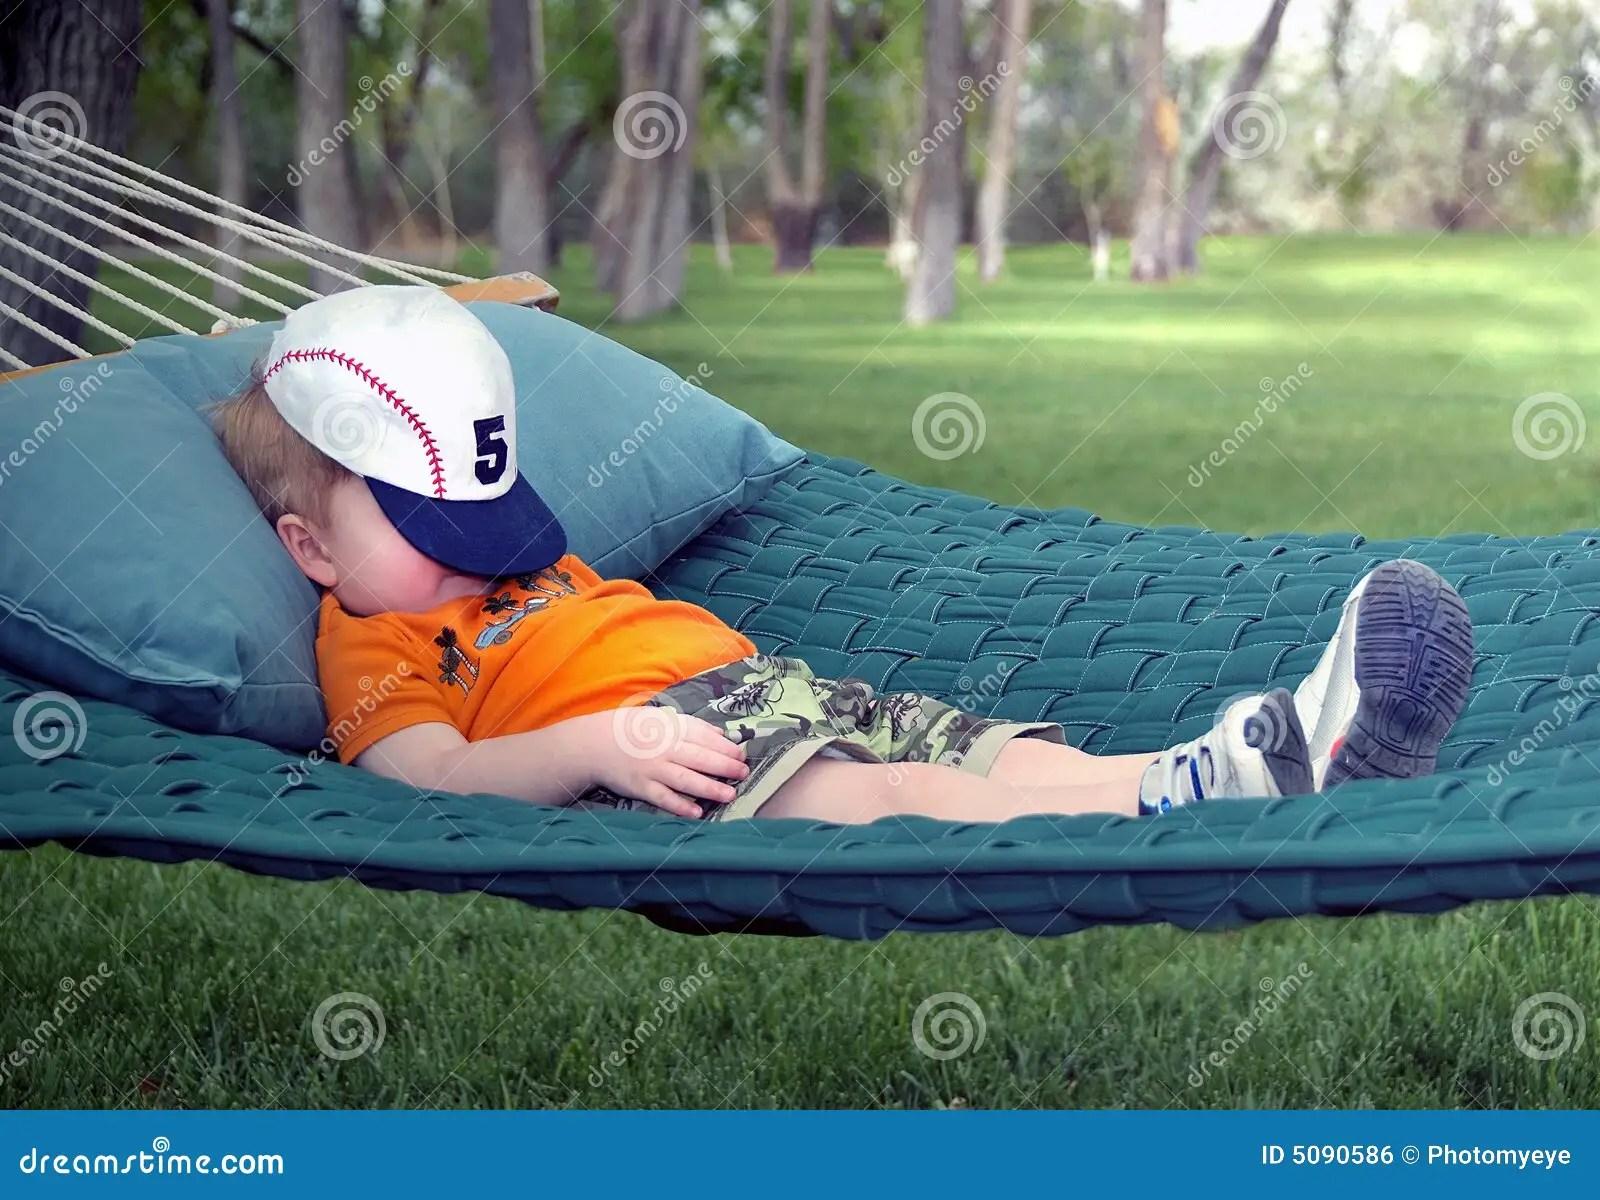 Boy Sleeping In Hammock Royalty Free Stock Image